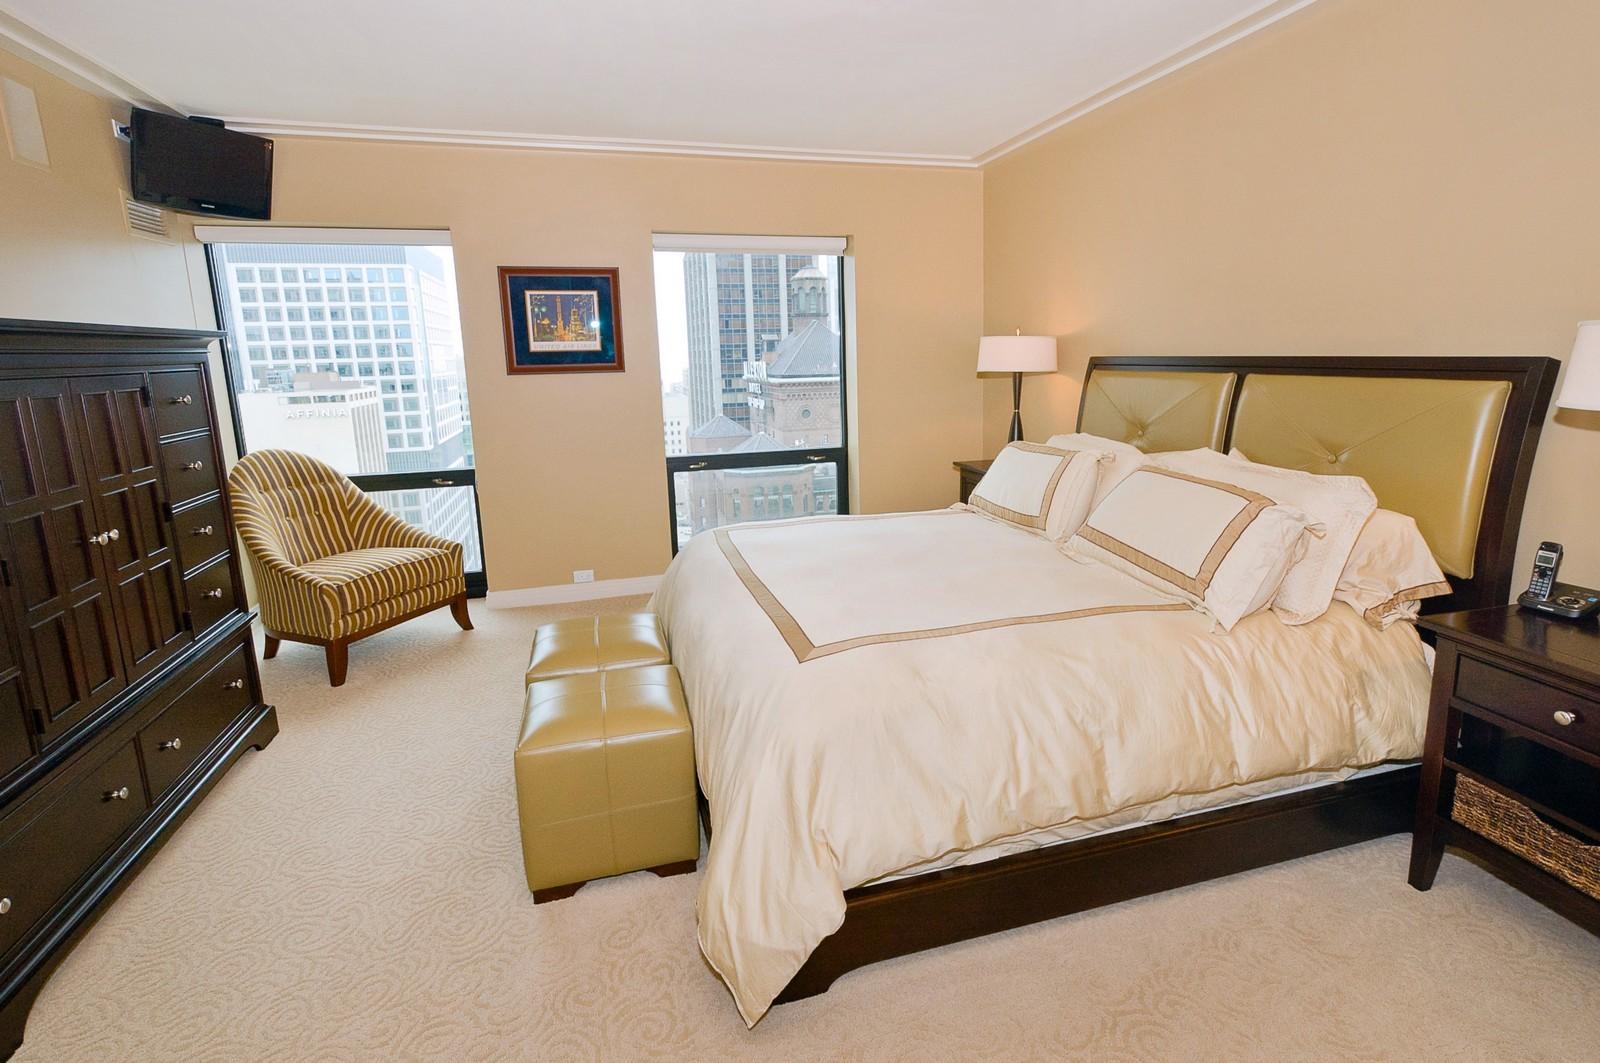 Real Estate Photography - 100 E Huron, 2103, Chicago, IL, 60611 - Master Bedroom